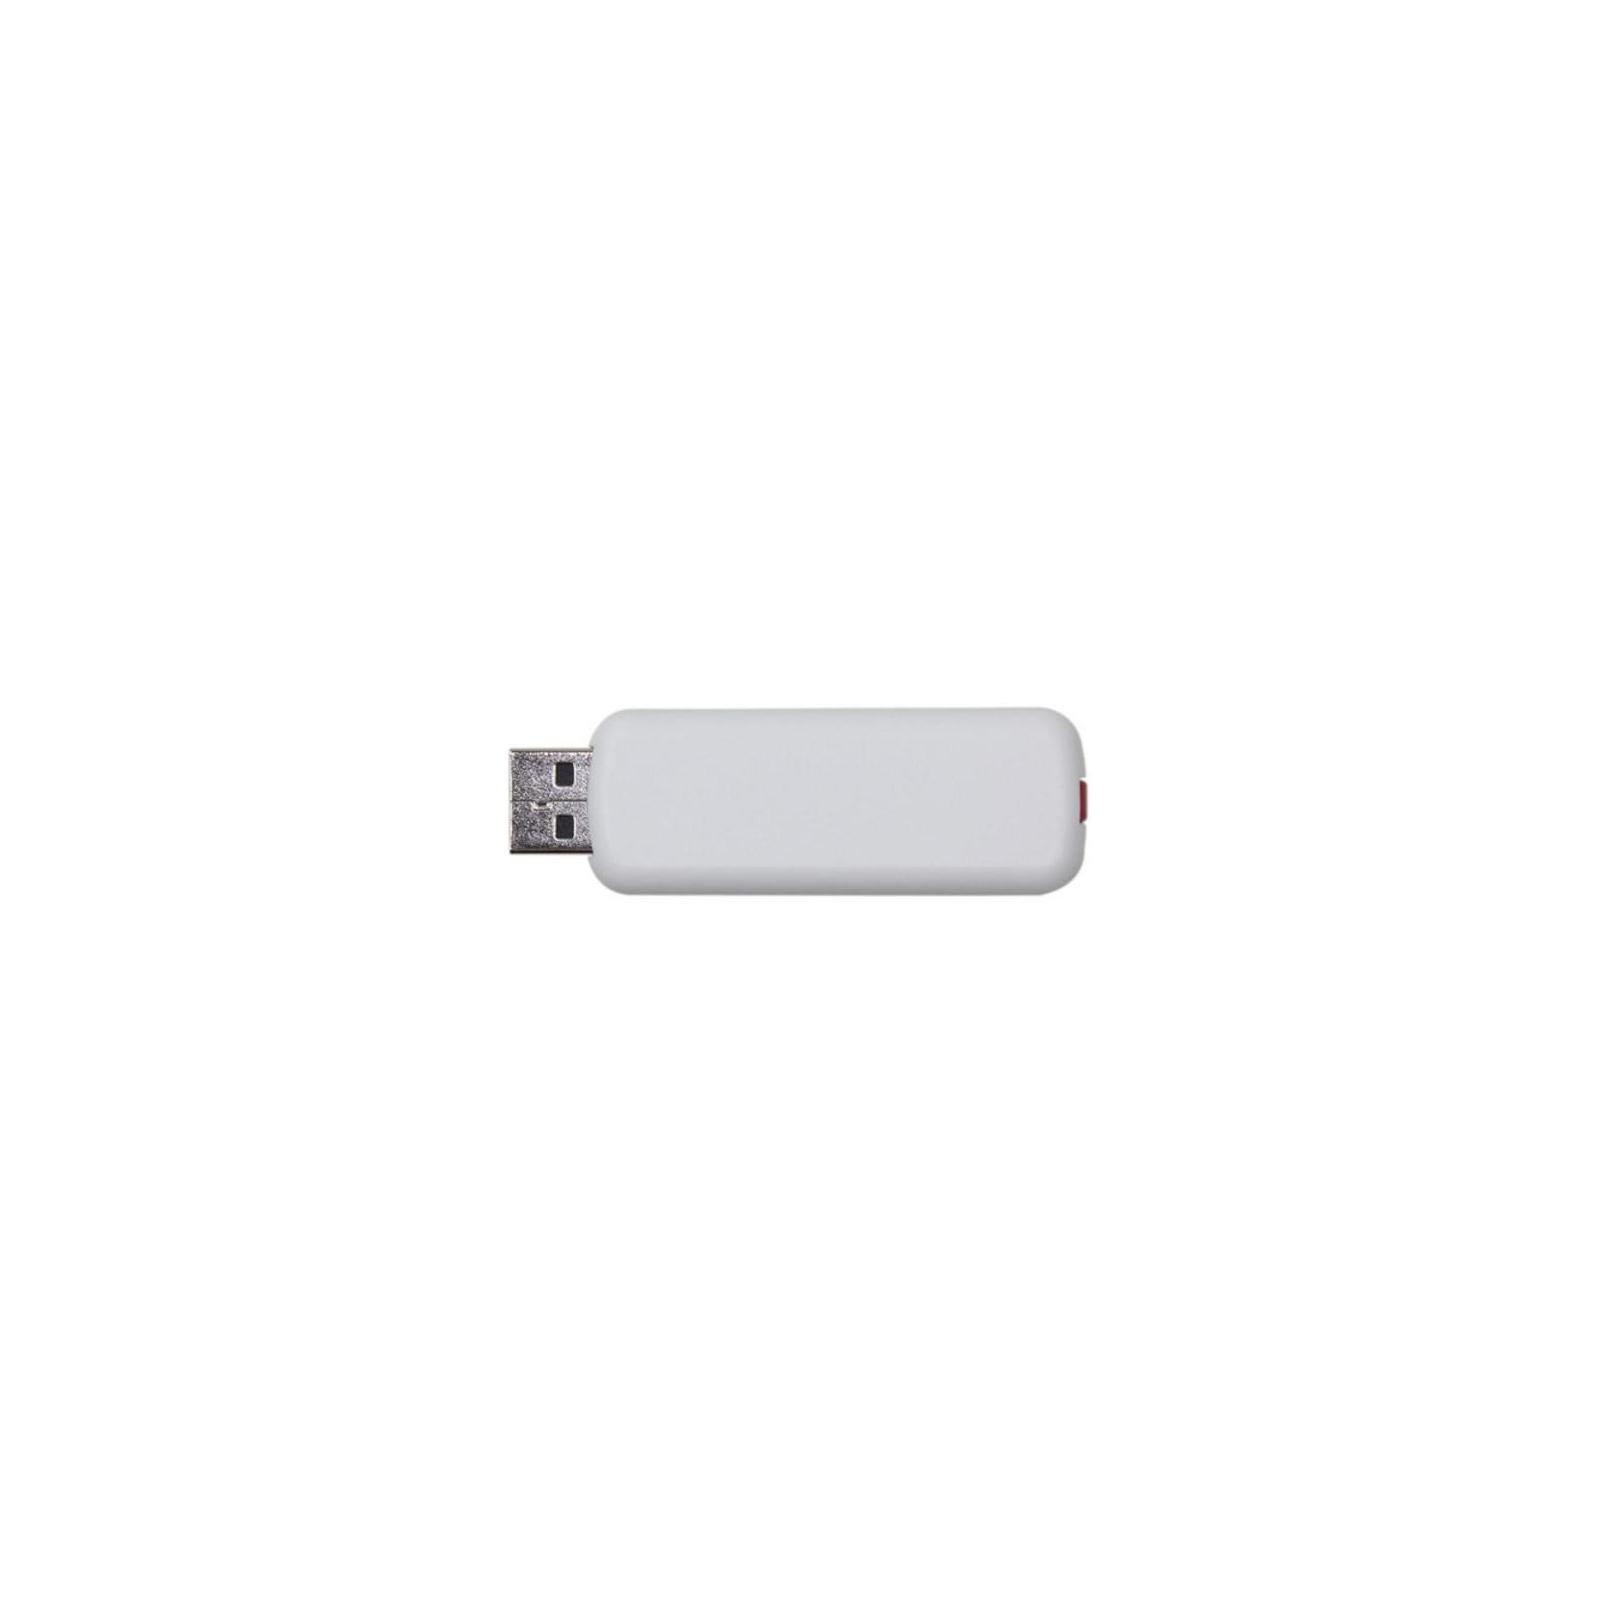 USB флеш накопитель 64GB AH326 White RP USB2.0 Apacer (AP64GAH326W-1) изображение 2